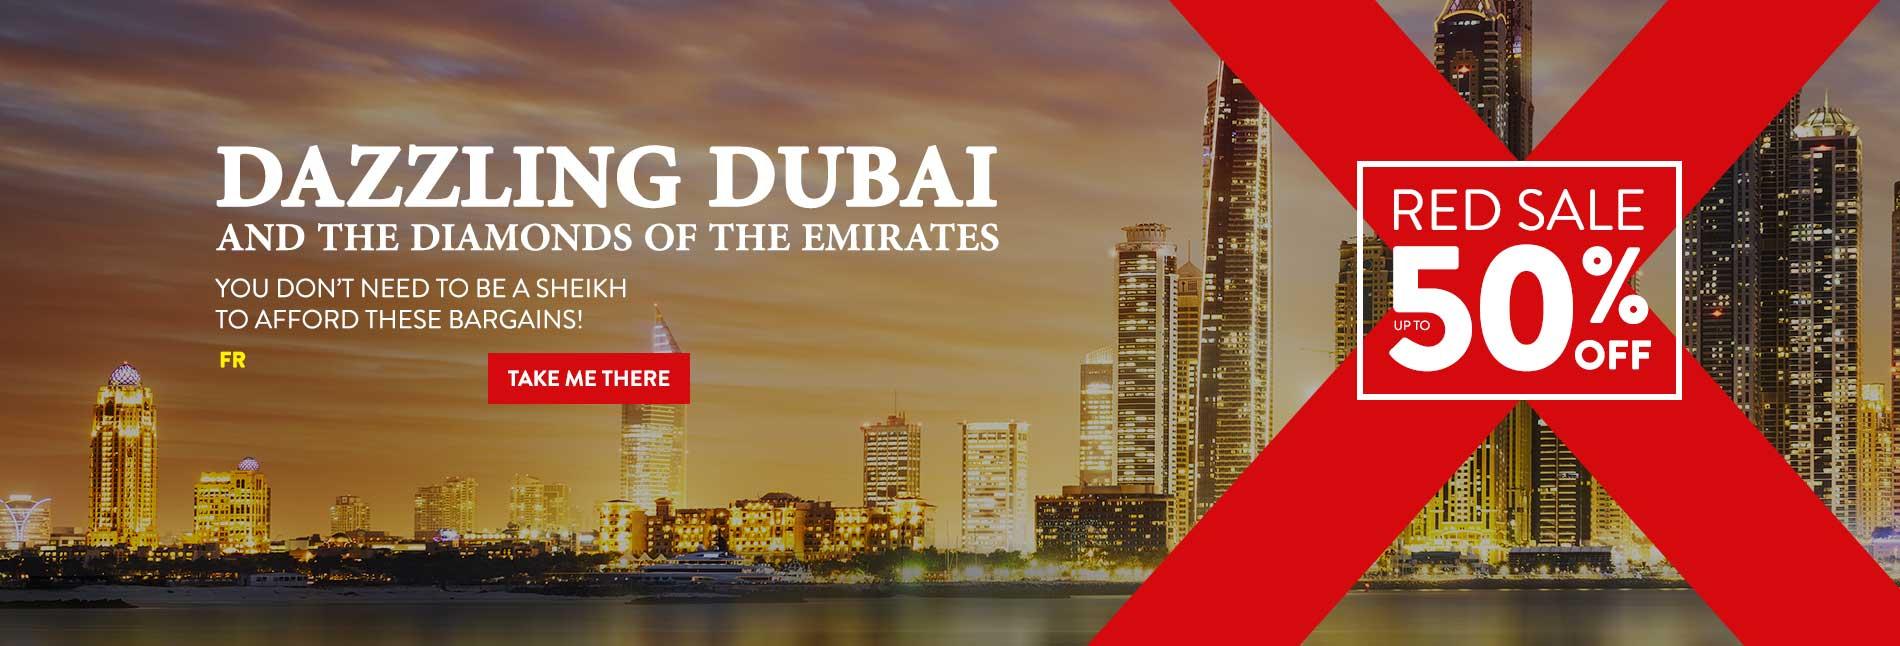 Dubai Cruise Deals